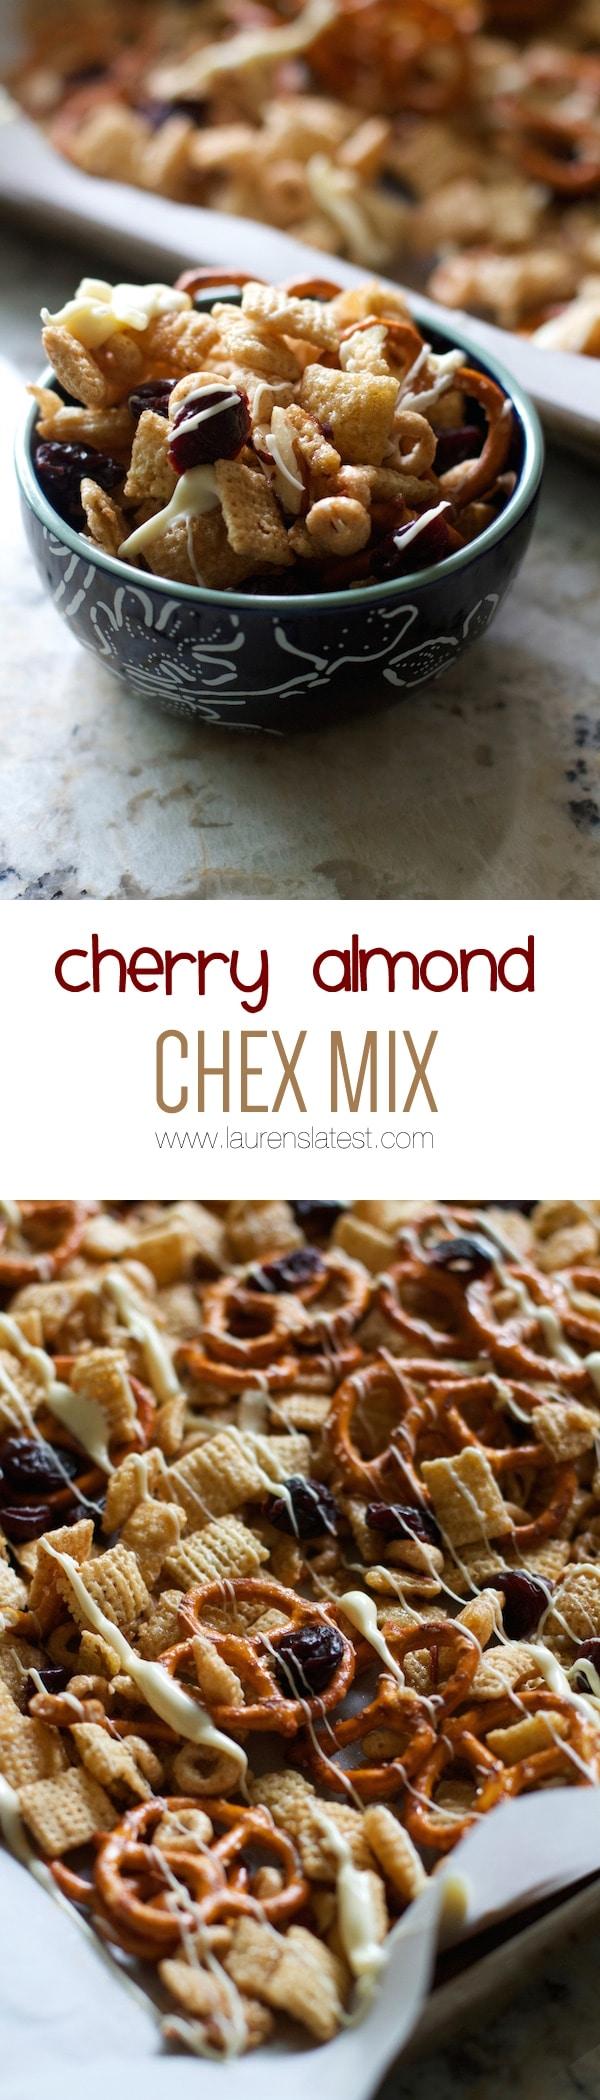 cherry almond chex mix